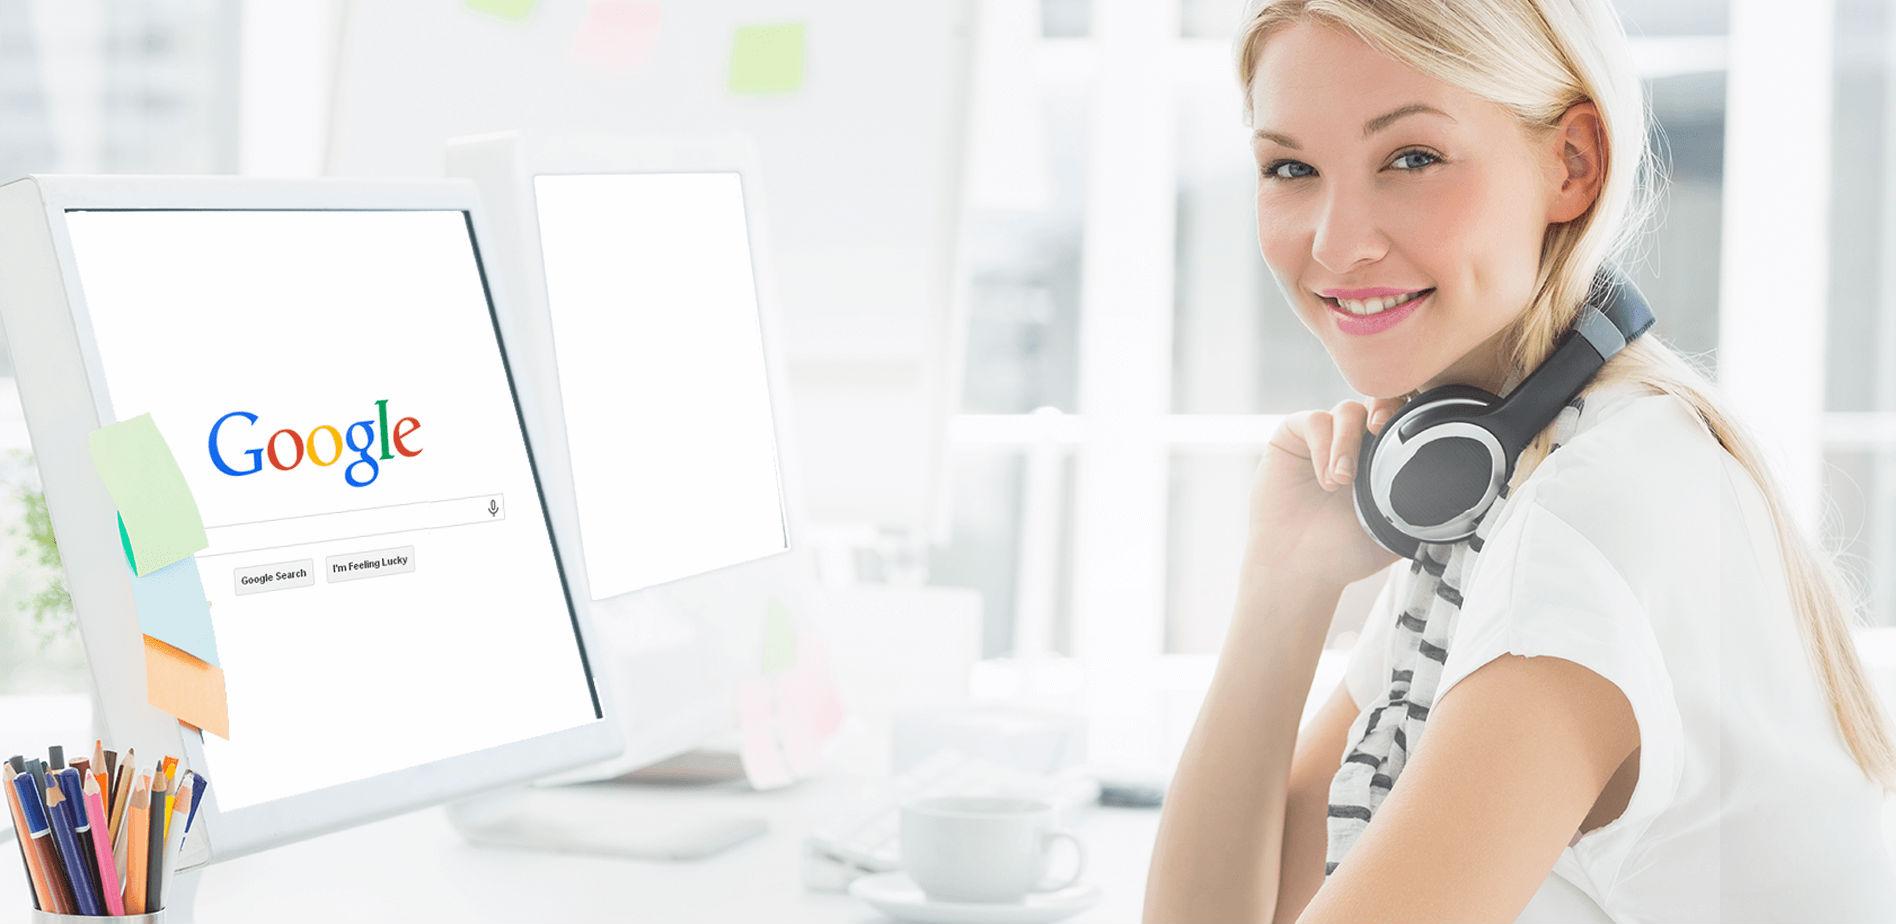 Seo Оптимизация-Onljan Reklama - Cherry Advertising-Реклама Онлайн-Онлайн Реклама